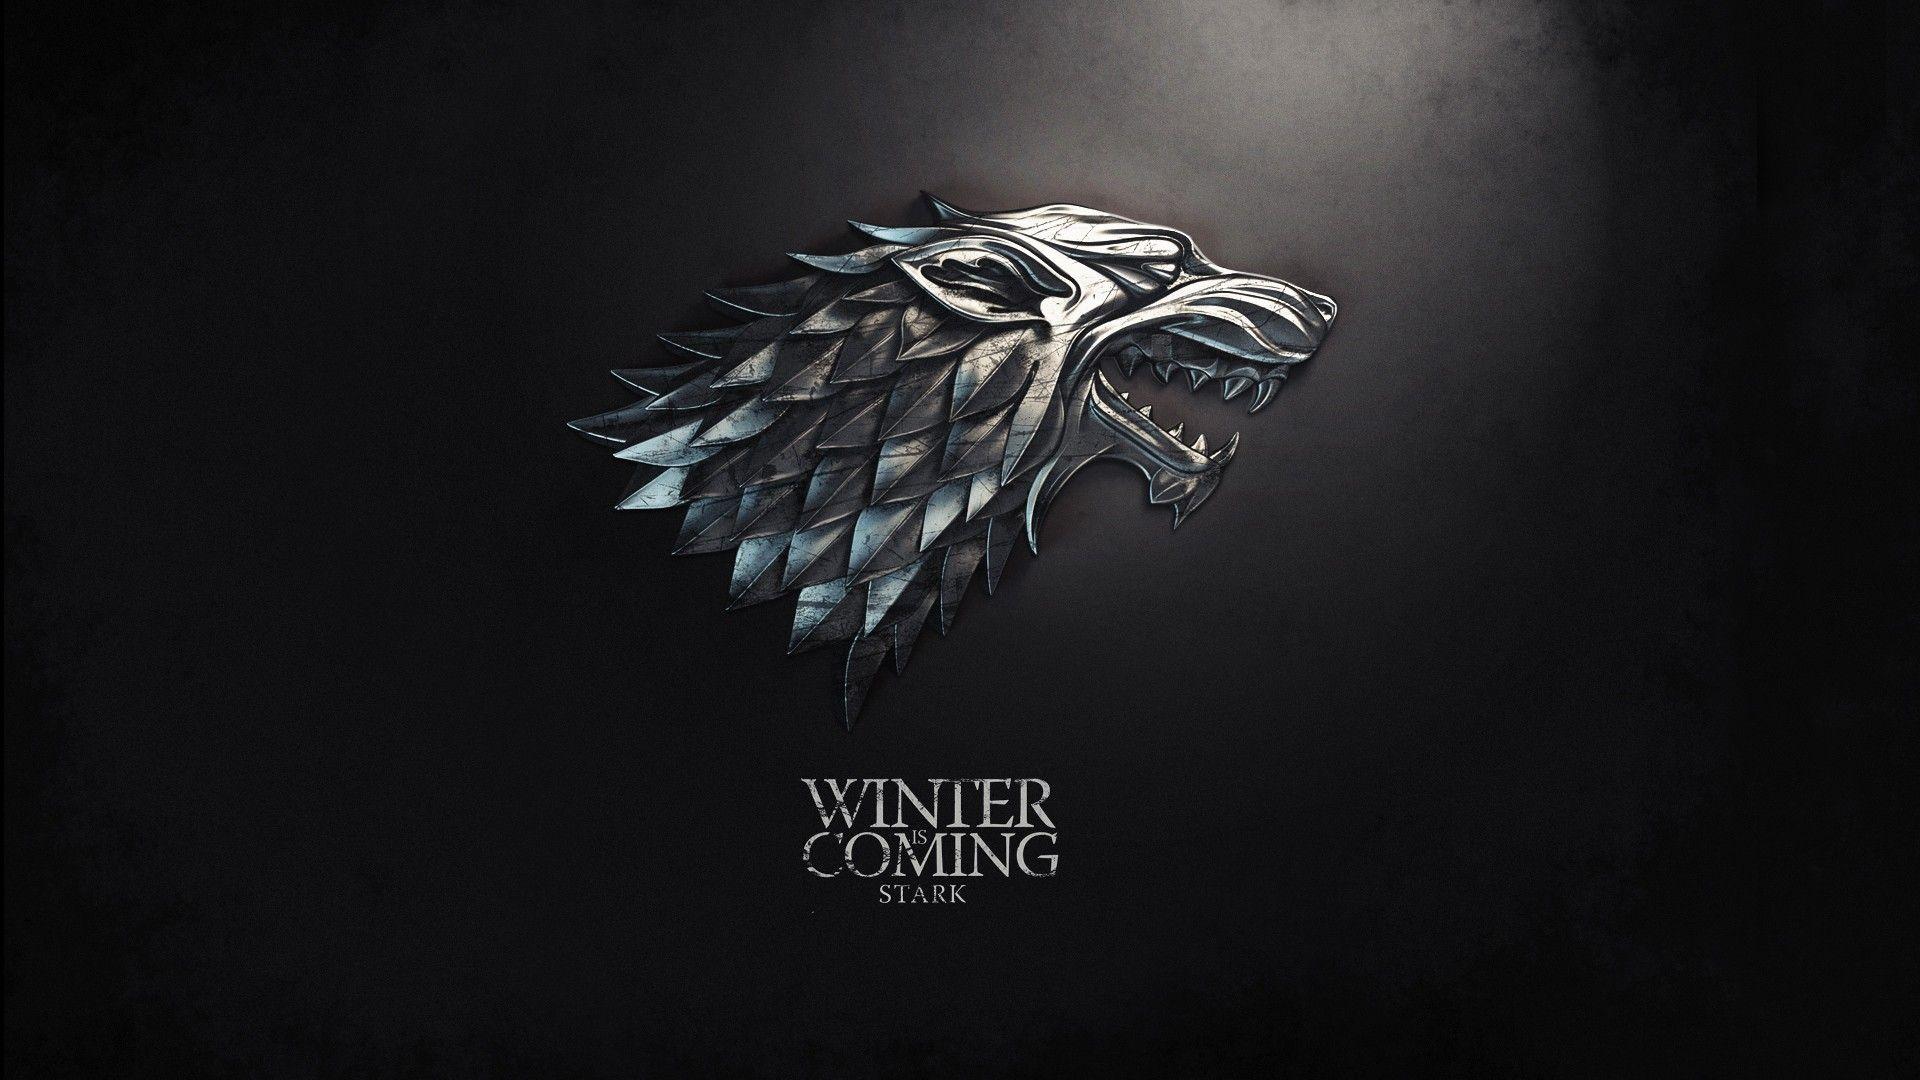 Minimalism Game Of Thrones Sigils Wallpaper Game Of Thrones Tattoo Got Game Of Thrones Game Of Thrones Houses